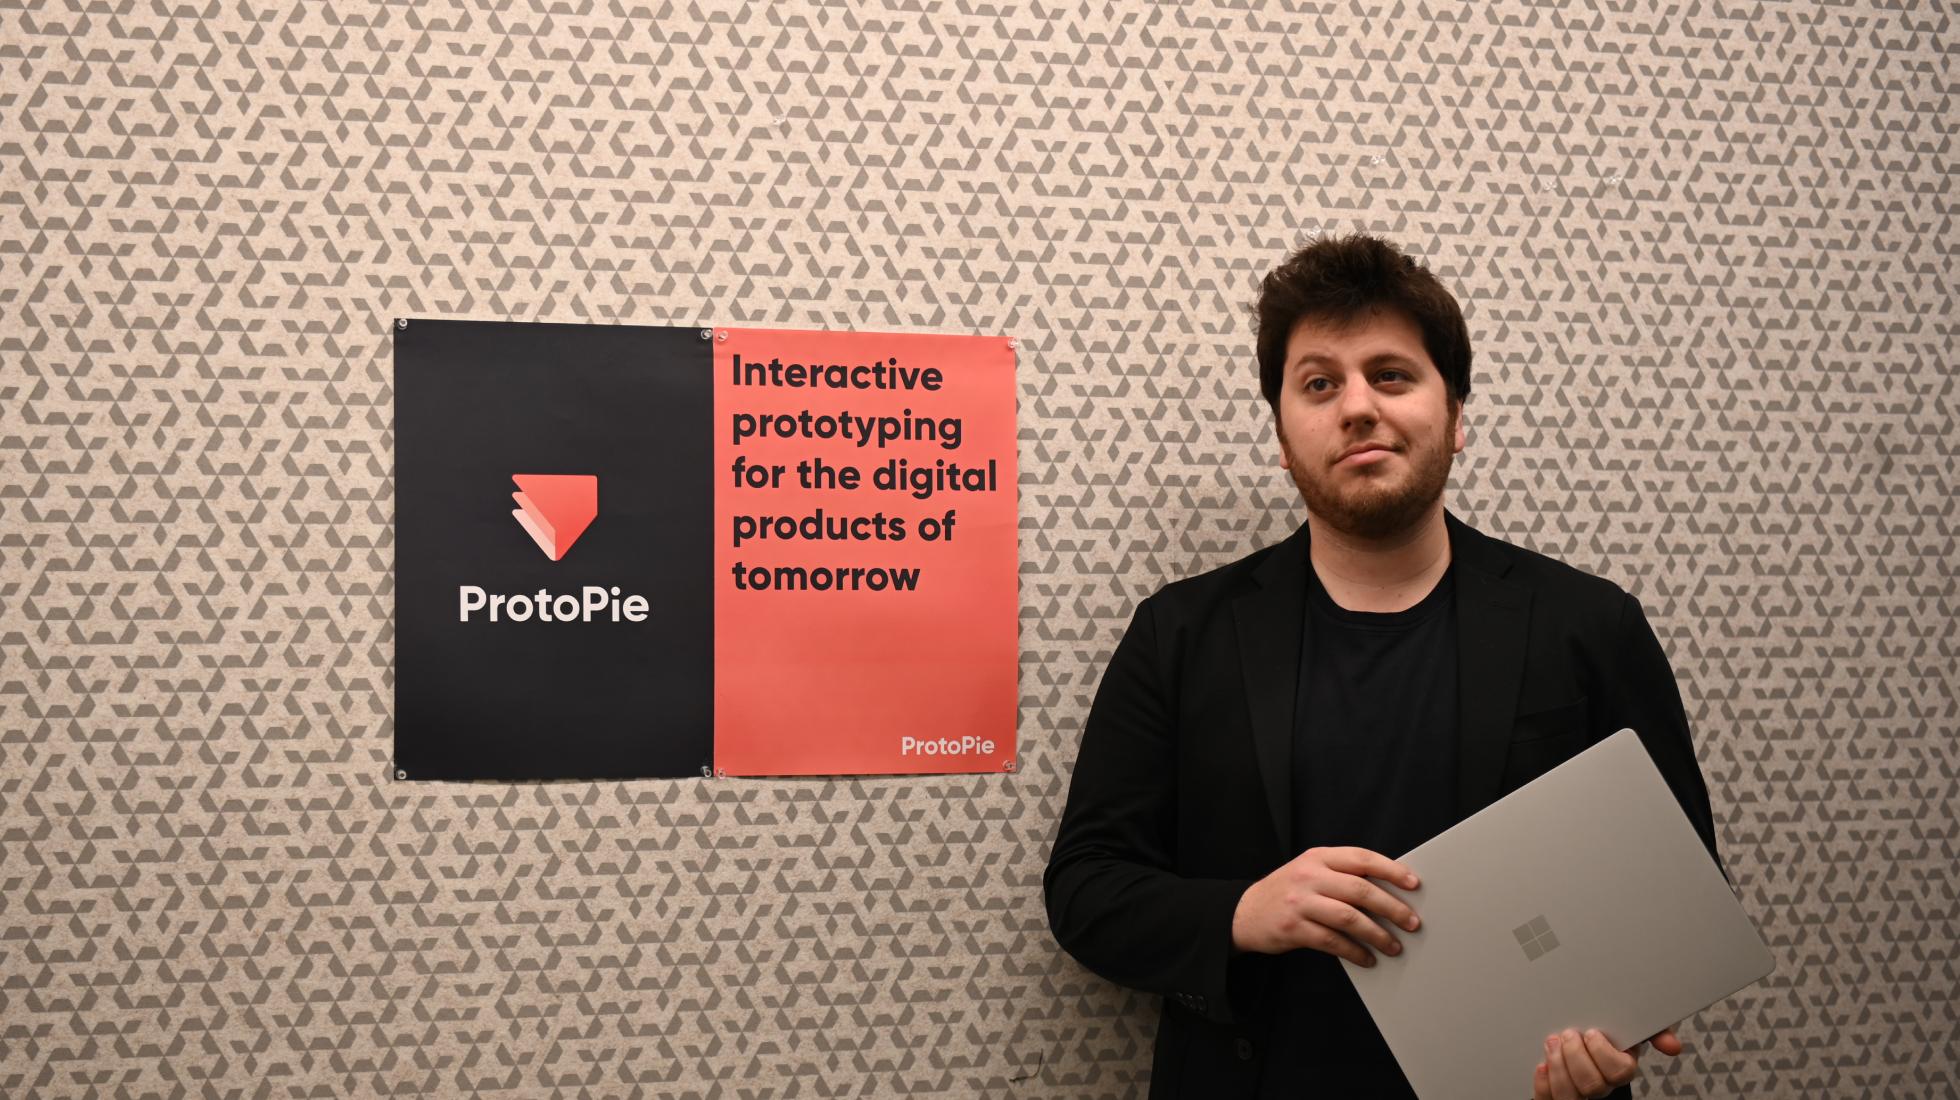 Eduardo Sonnino senior designer at Microsoft